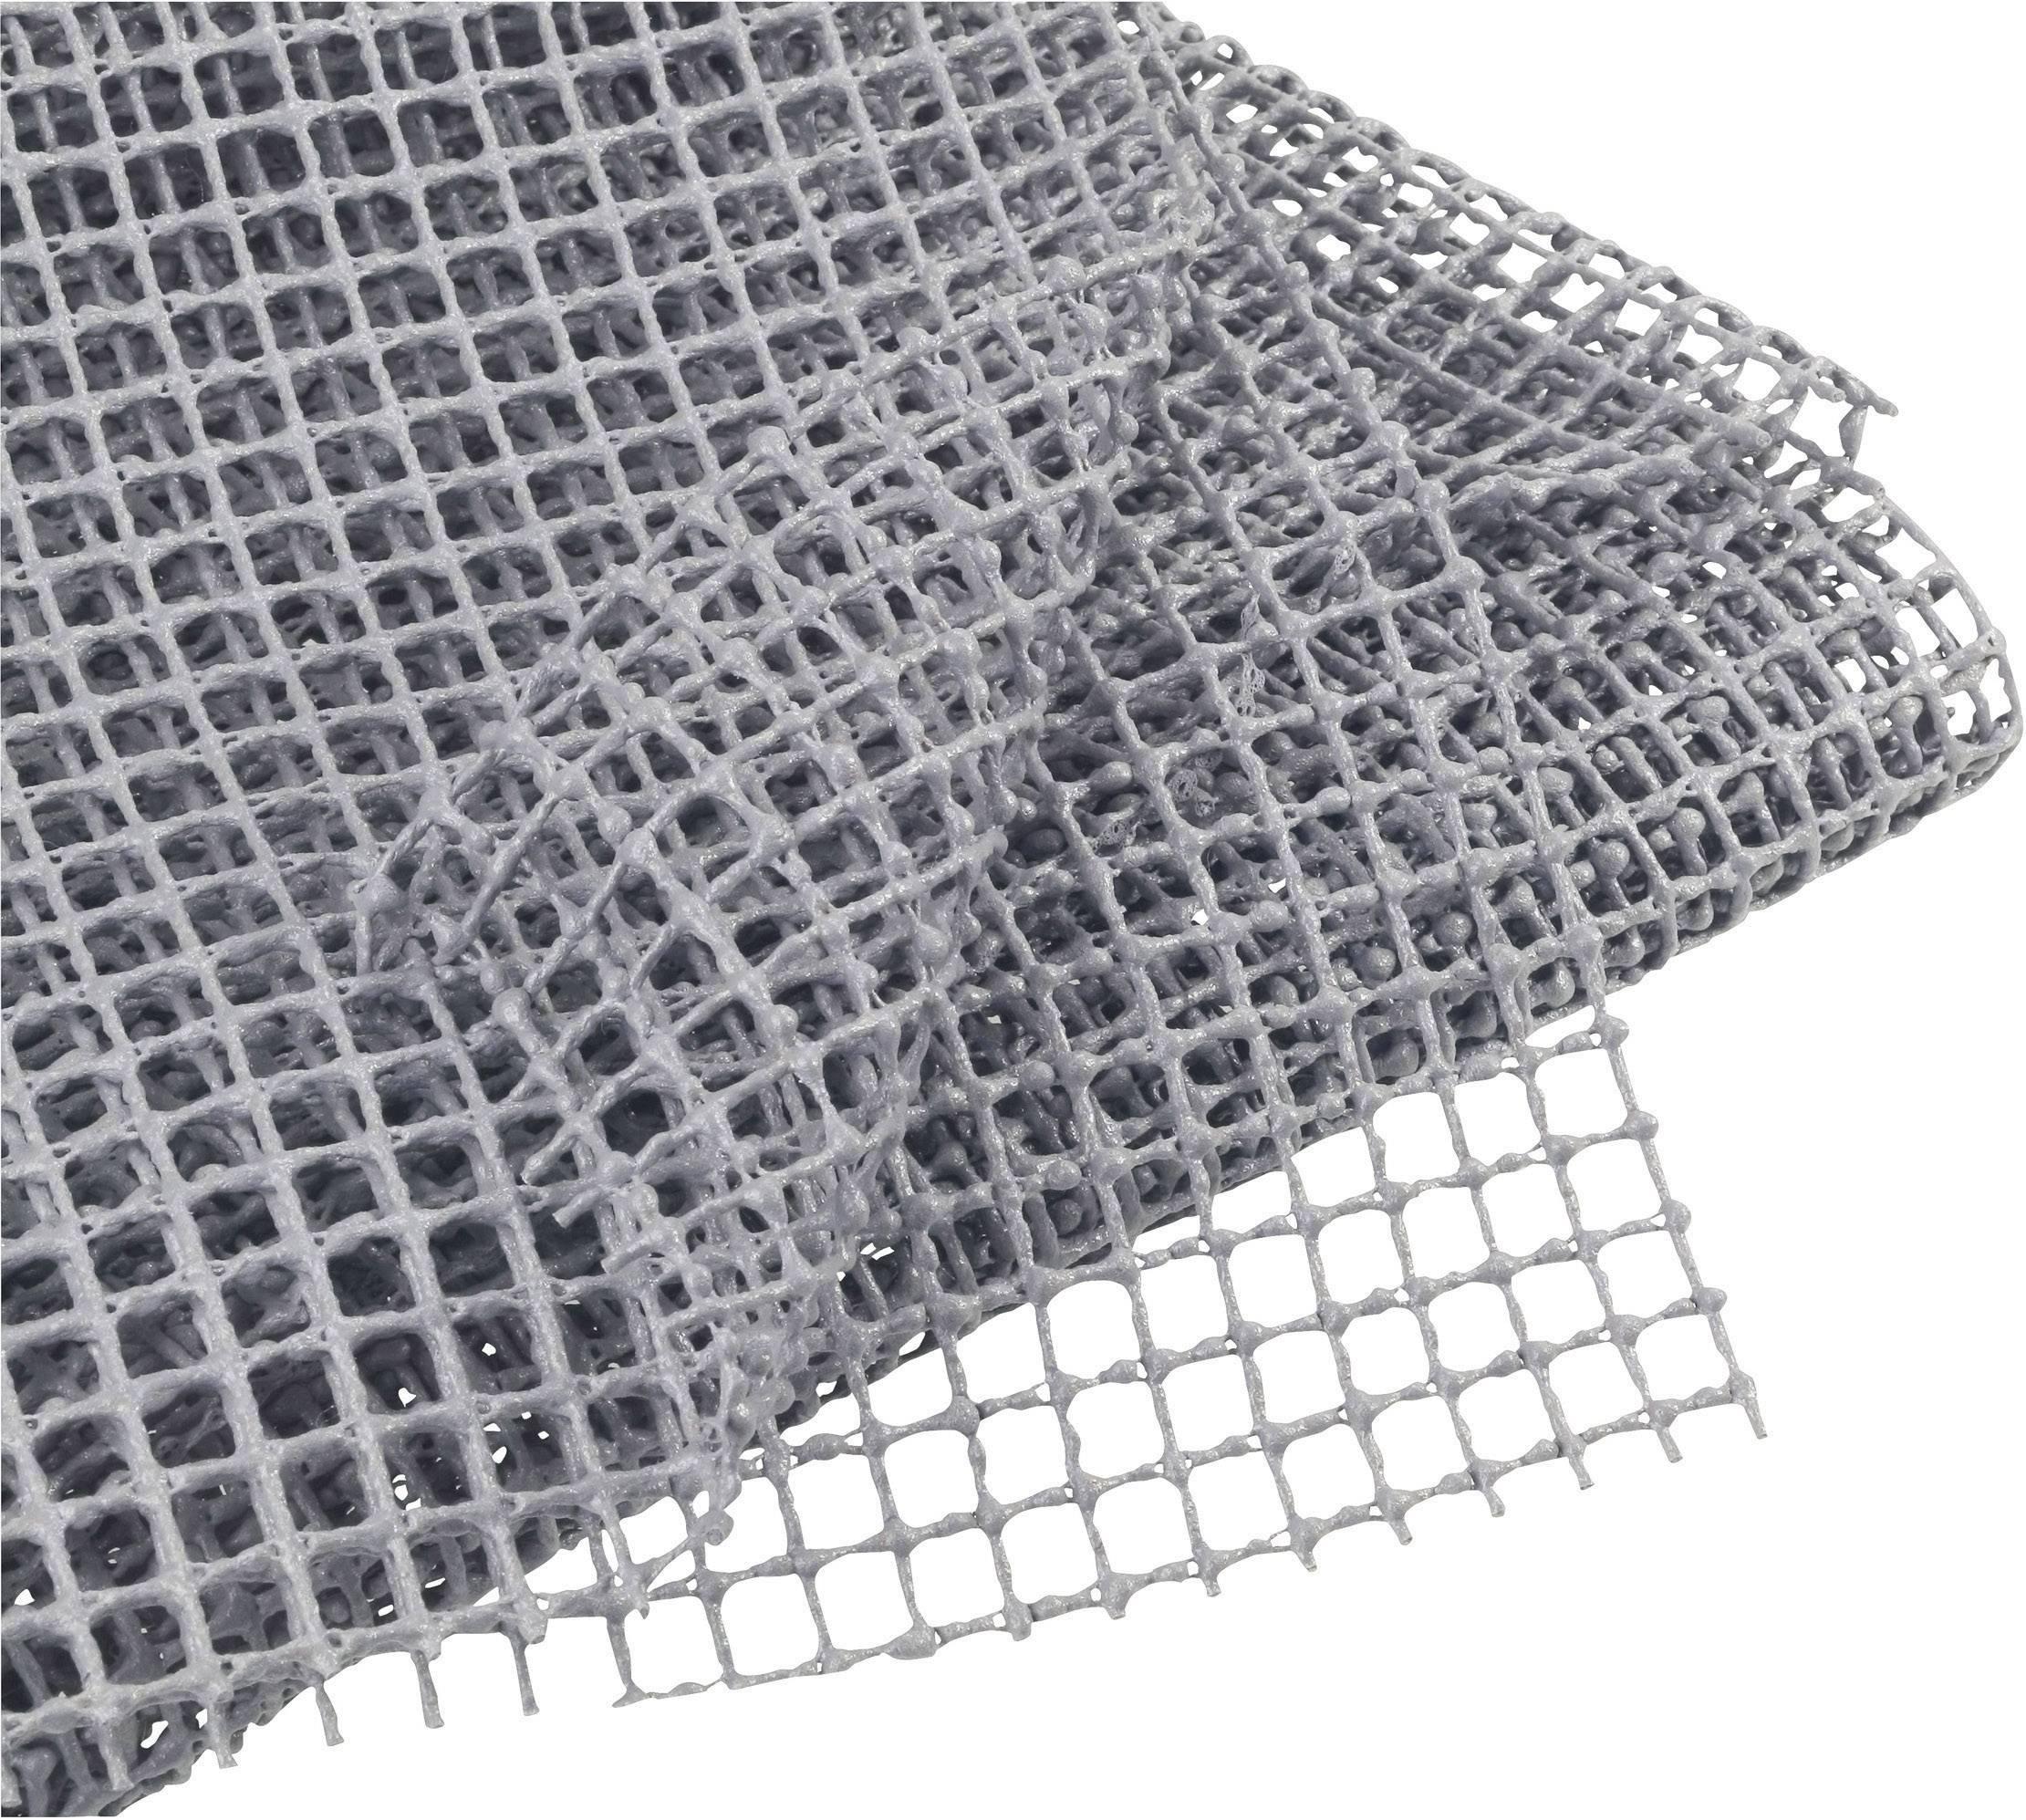 Protišmyková podložka 19.294, (d x š) 120 cm x 100 cm